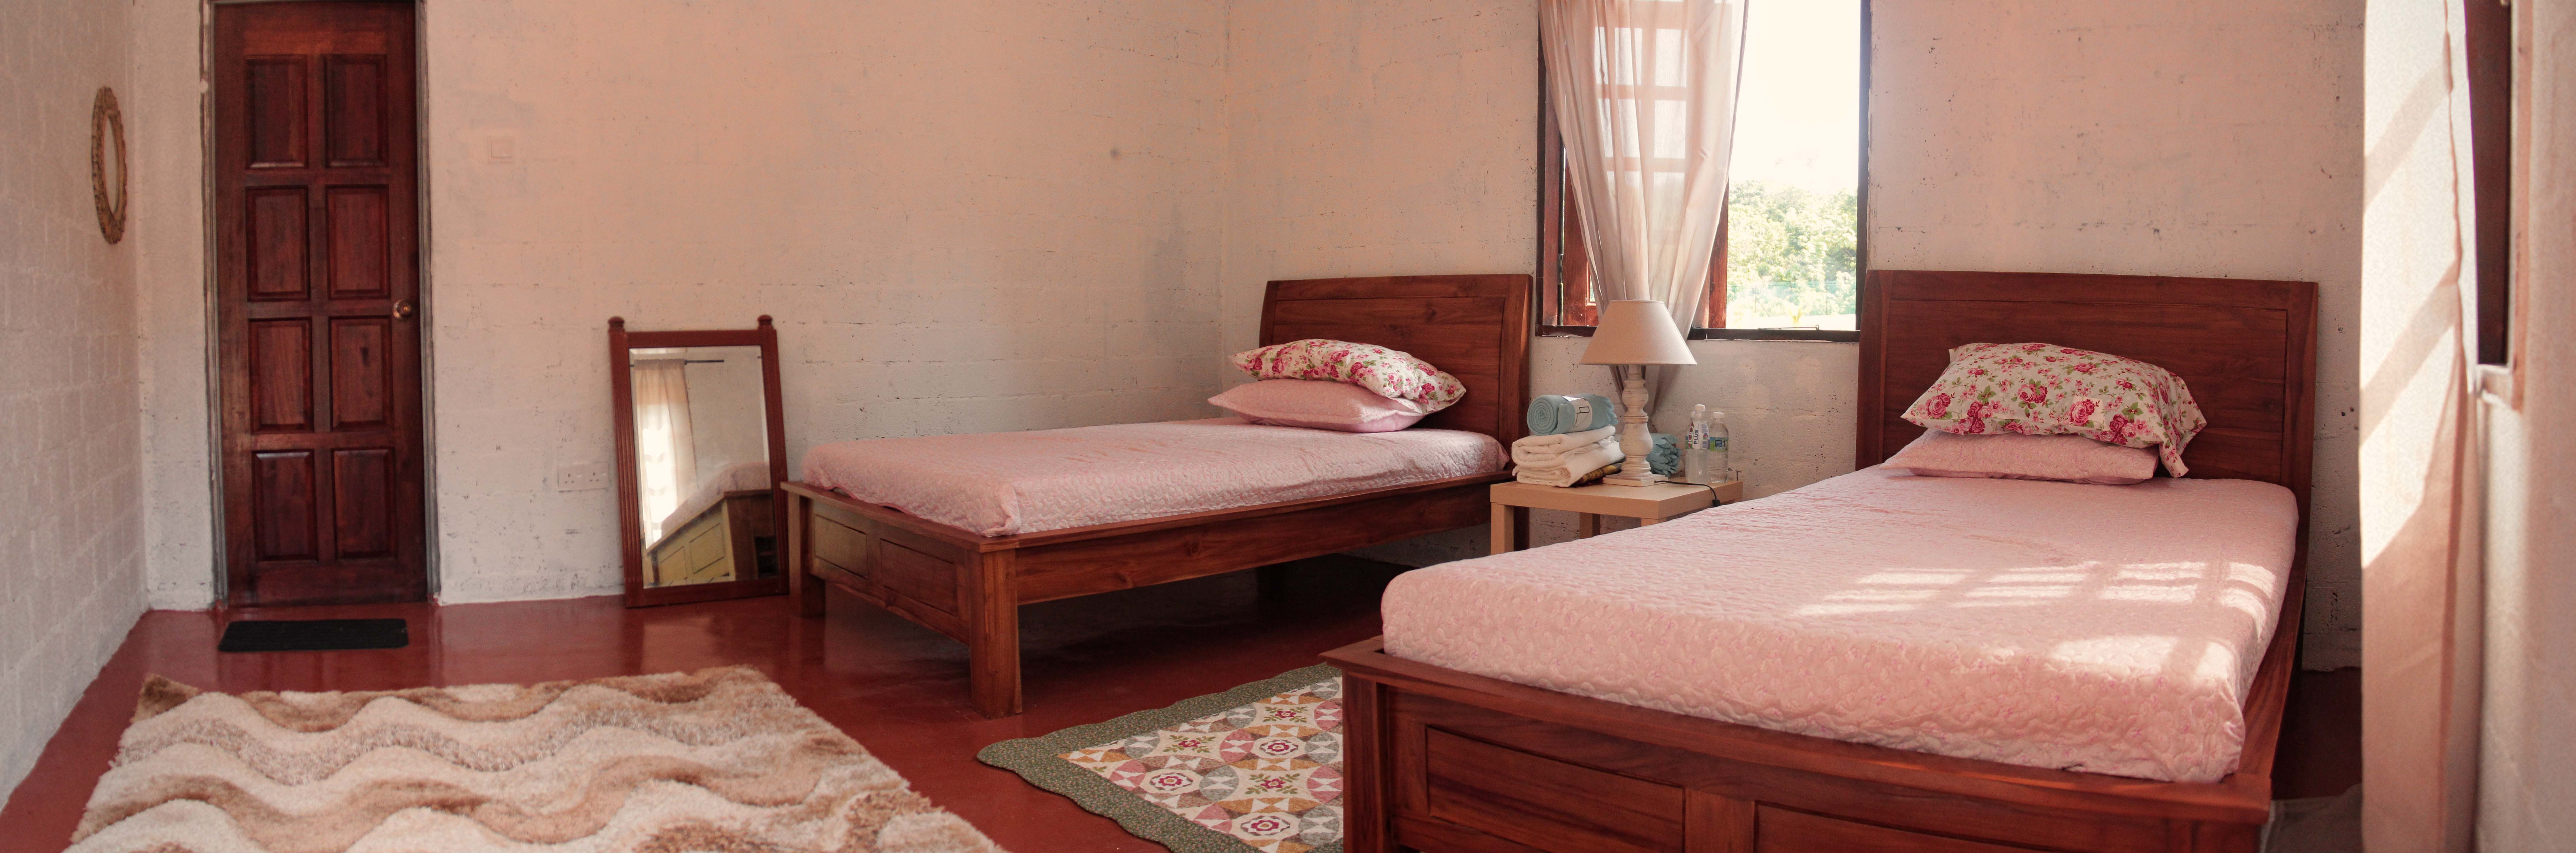 homestay-bilik-1